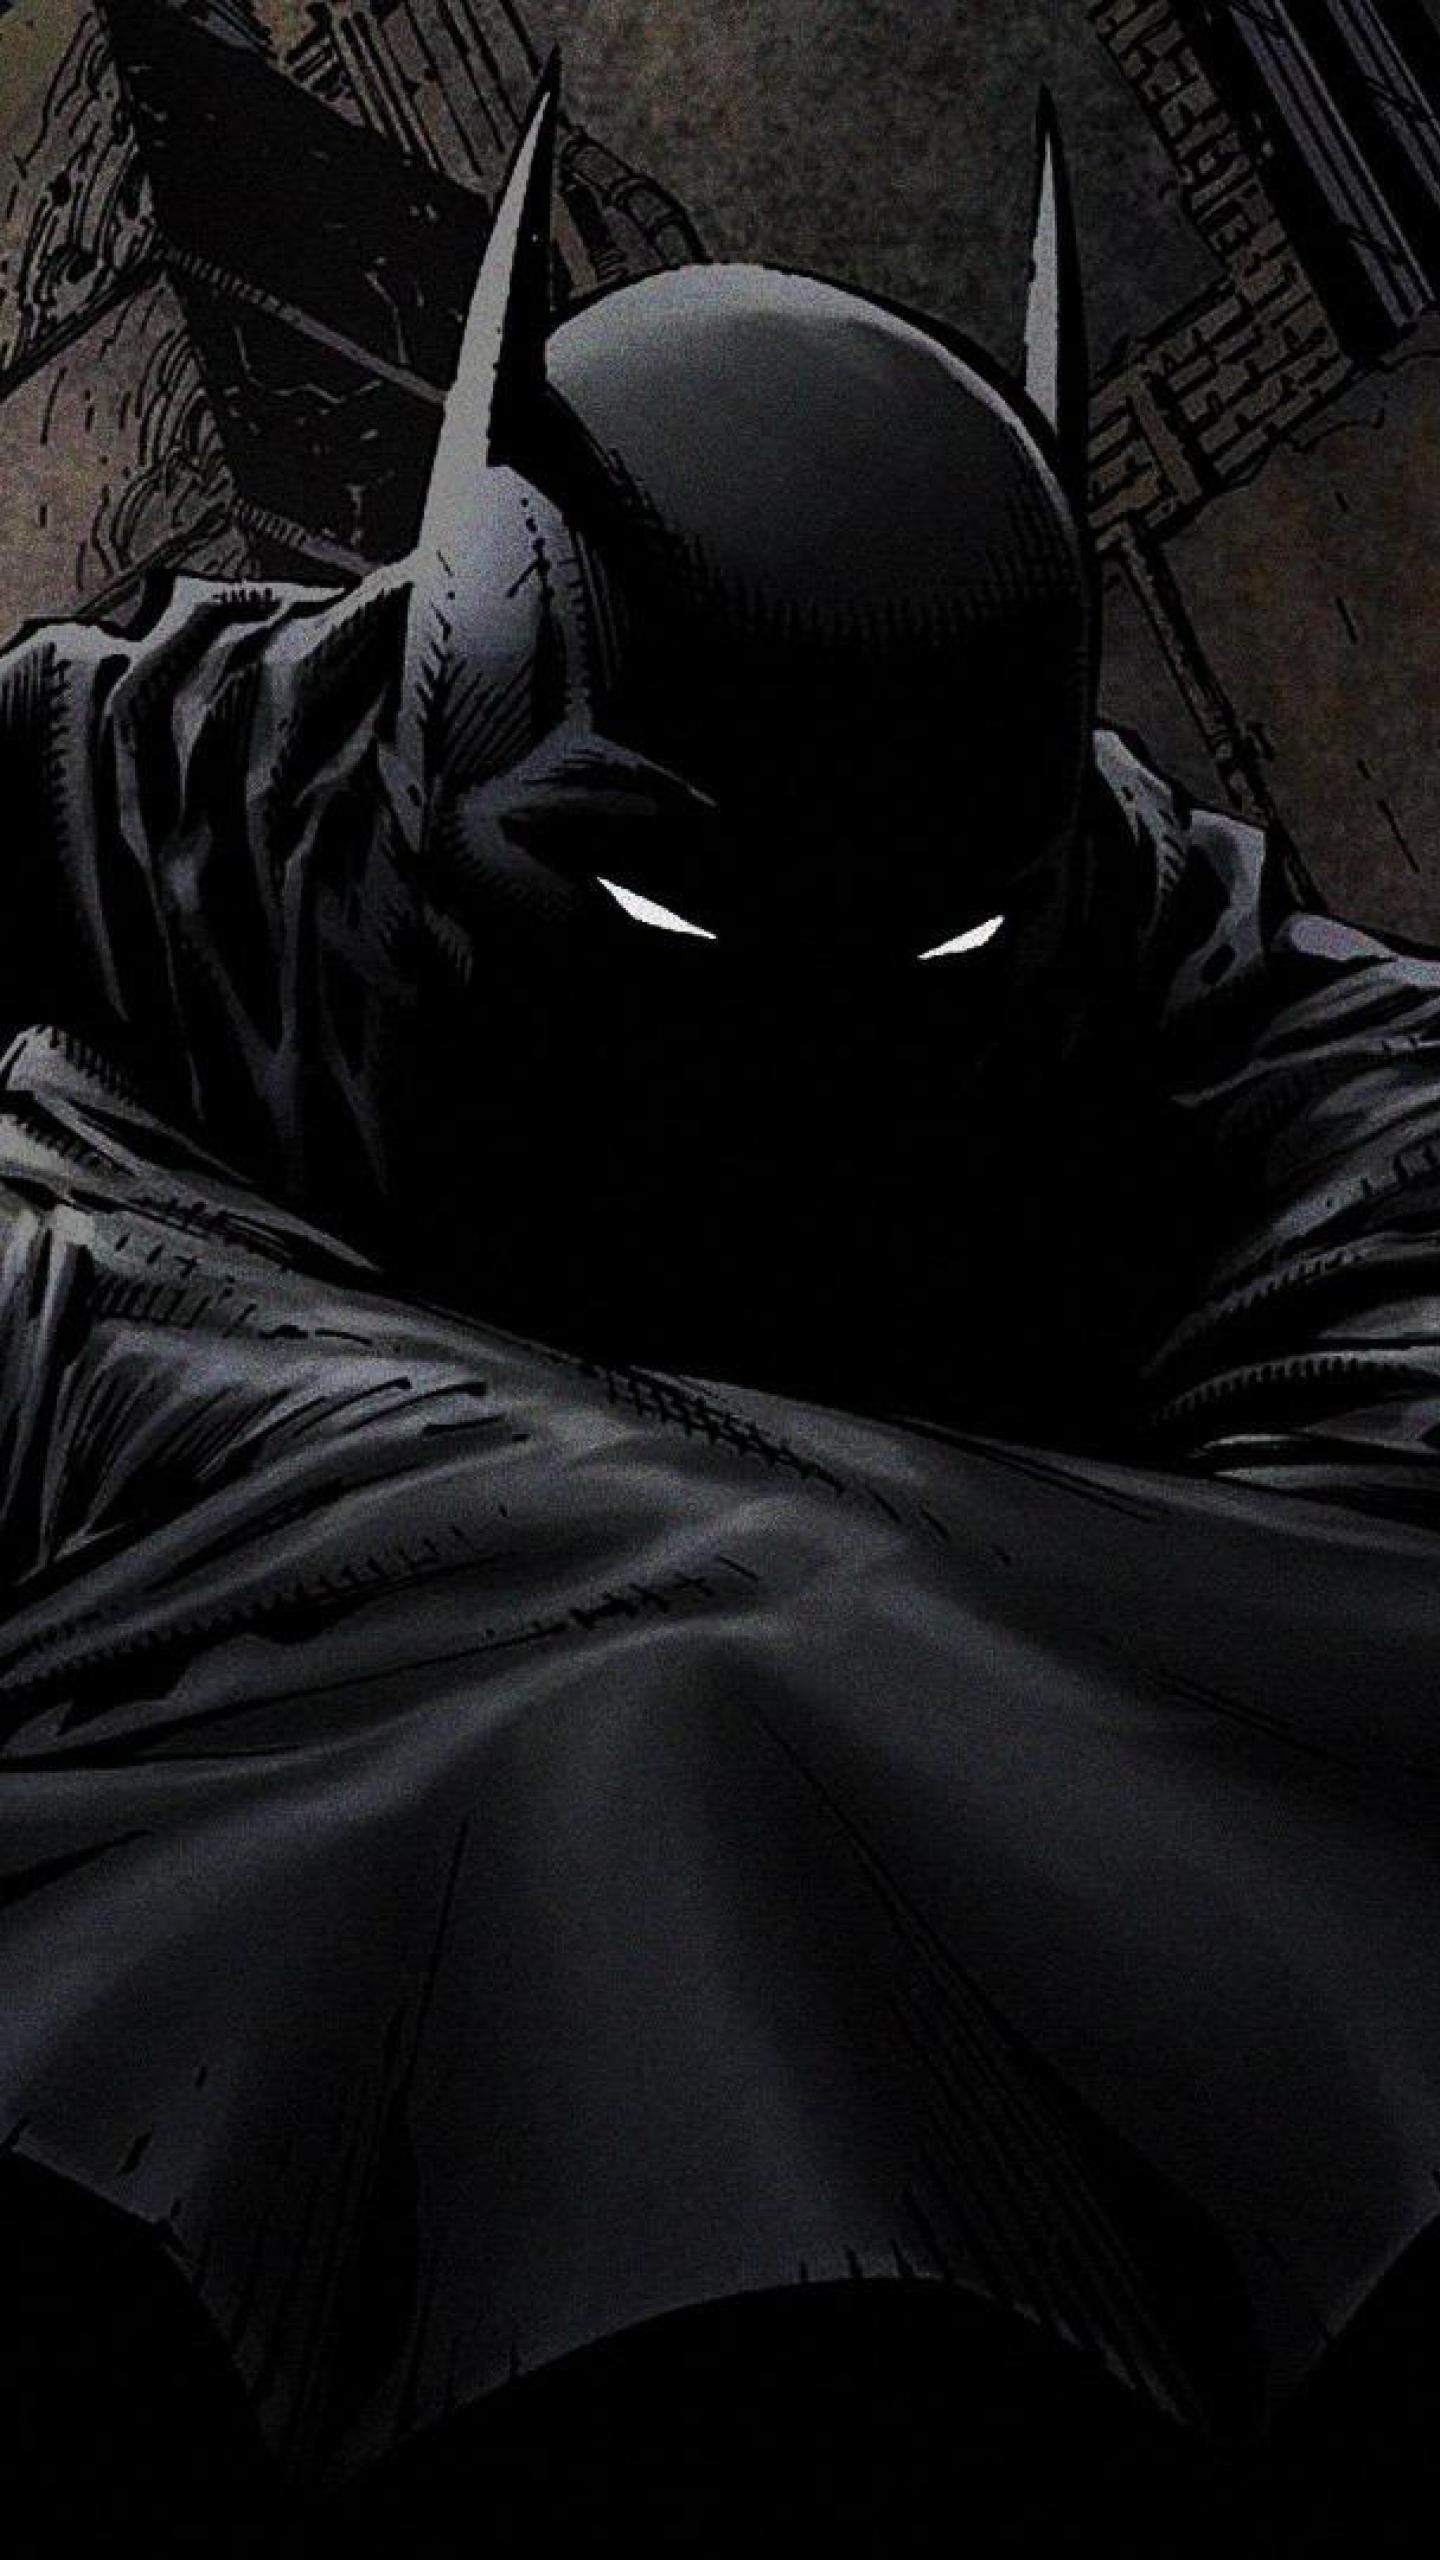 Batman HD Wallpapers, Desktop Backgrounds, Mobile Wallpapers